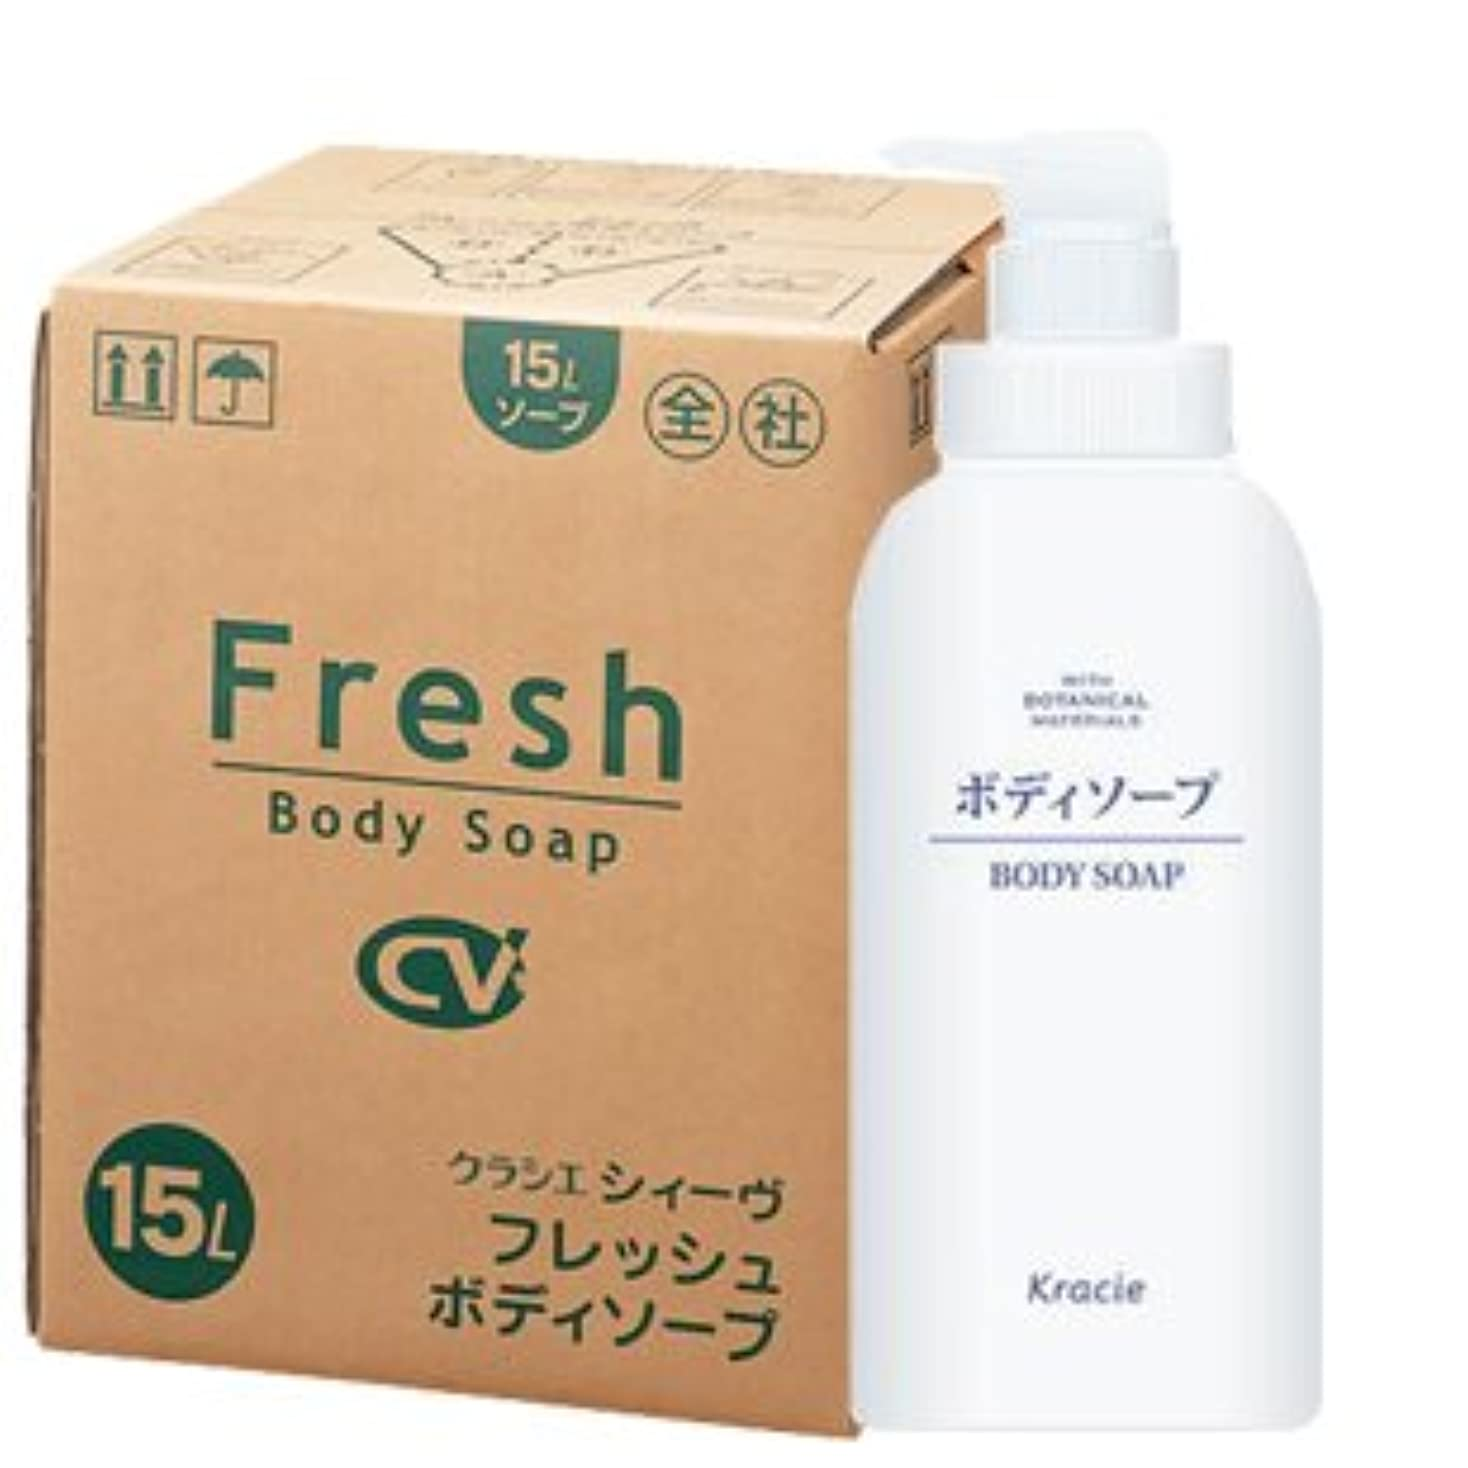 kracie(クラシエ) CV シィーヴ フレッシュシリーズ フレッシュボディソープ アロエエキス配合 グリーンフローラルの香り 15L 業務用 家庭様向け 容器不要